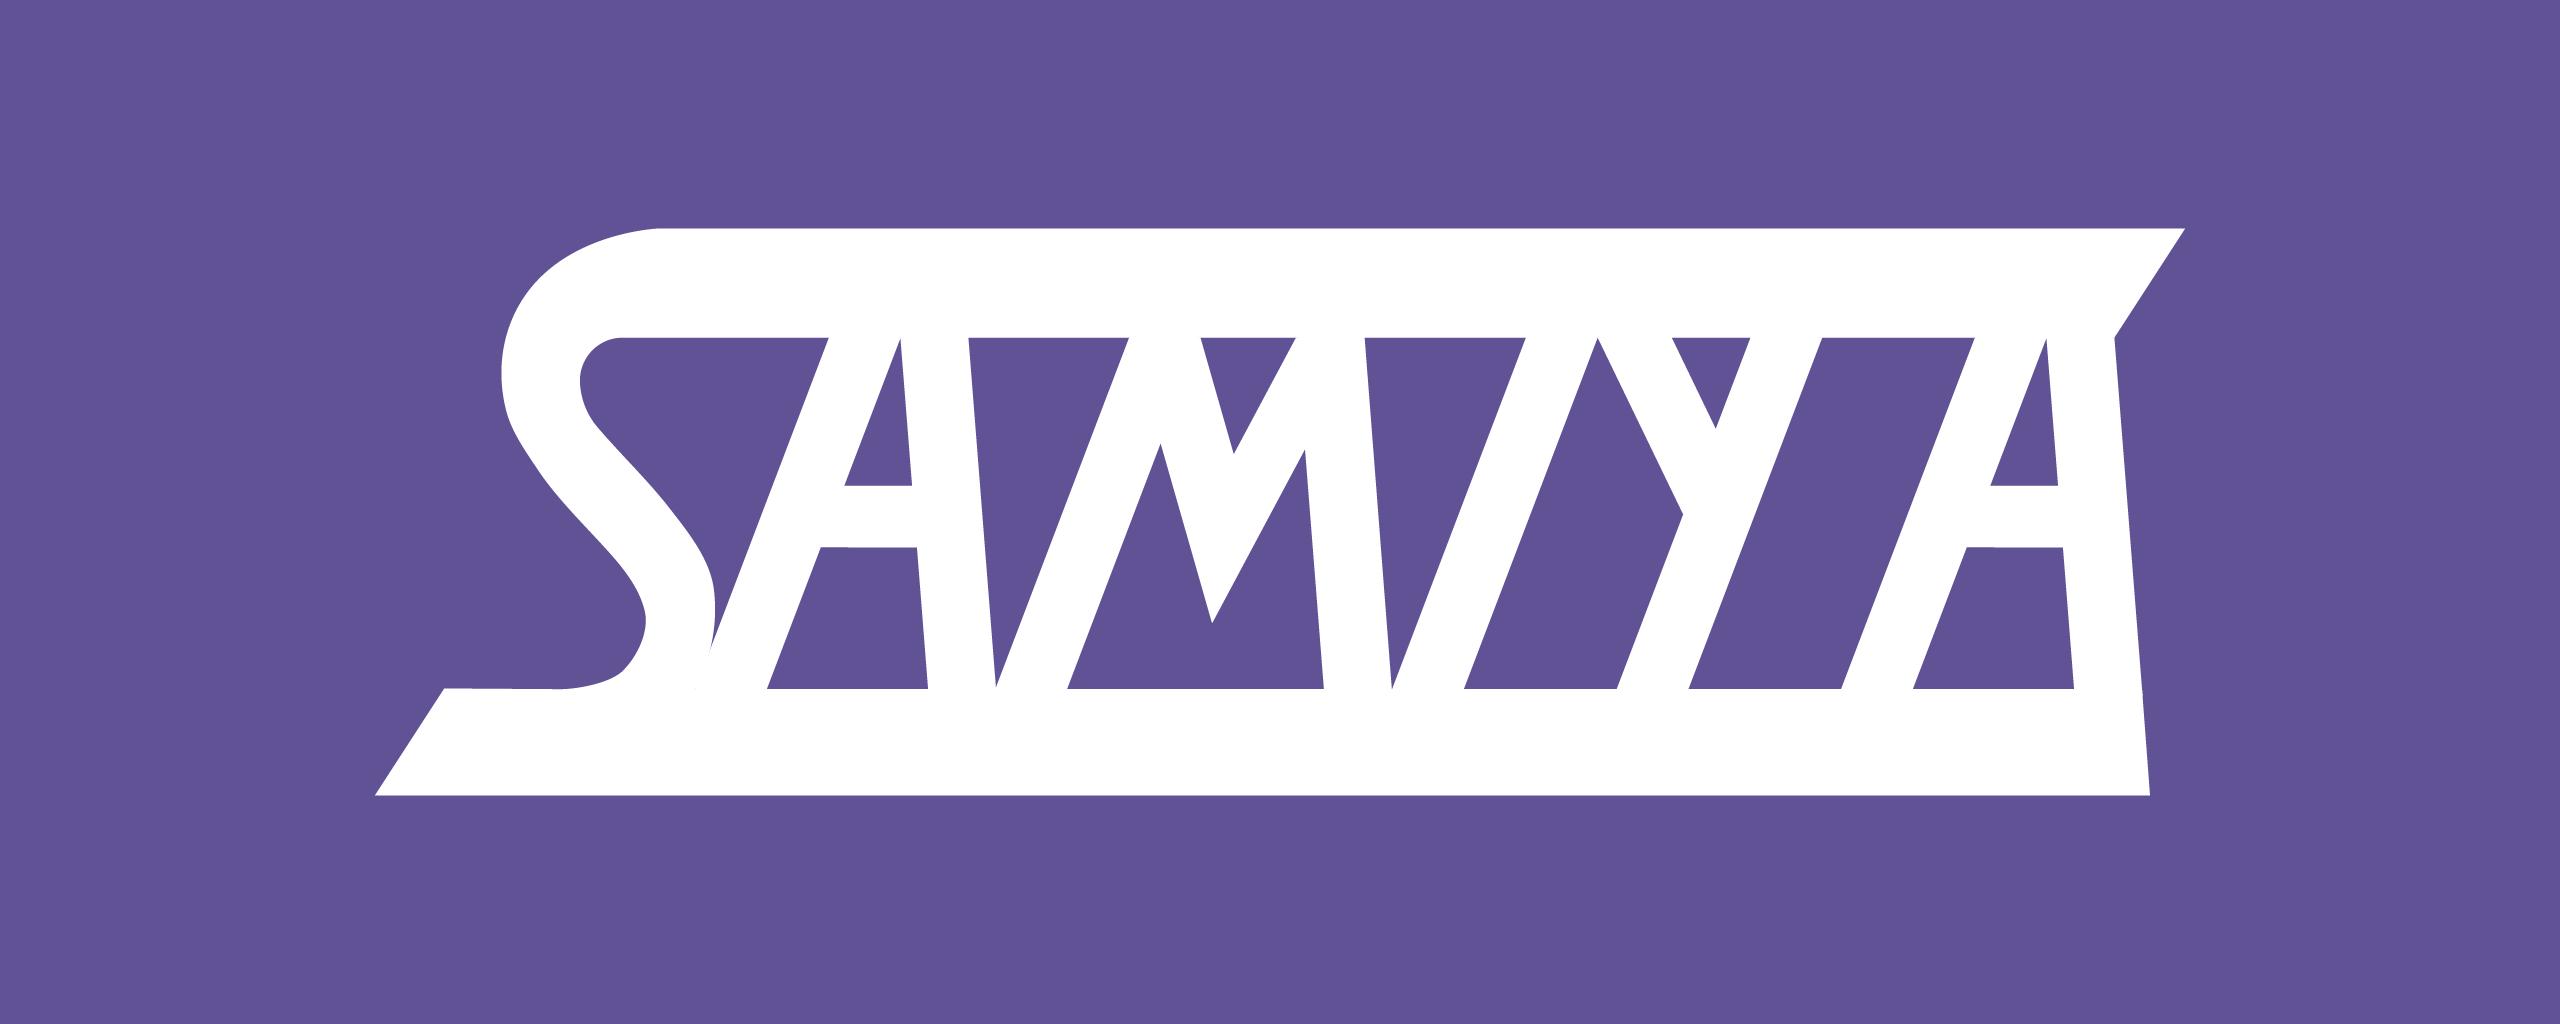 株式会社SAMIYA